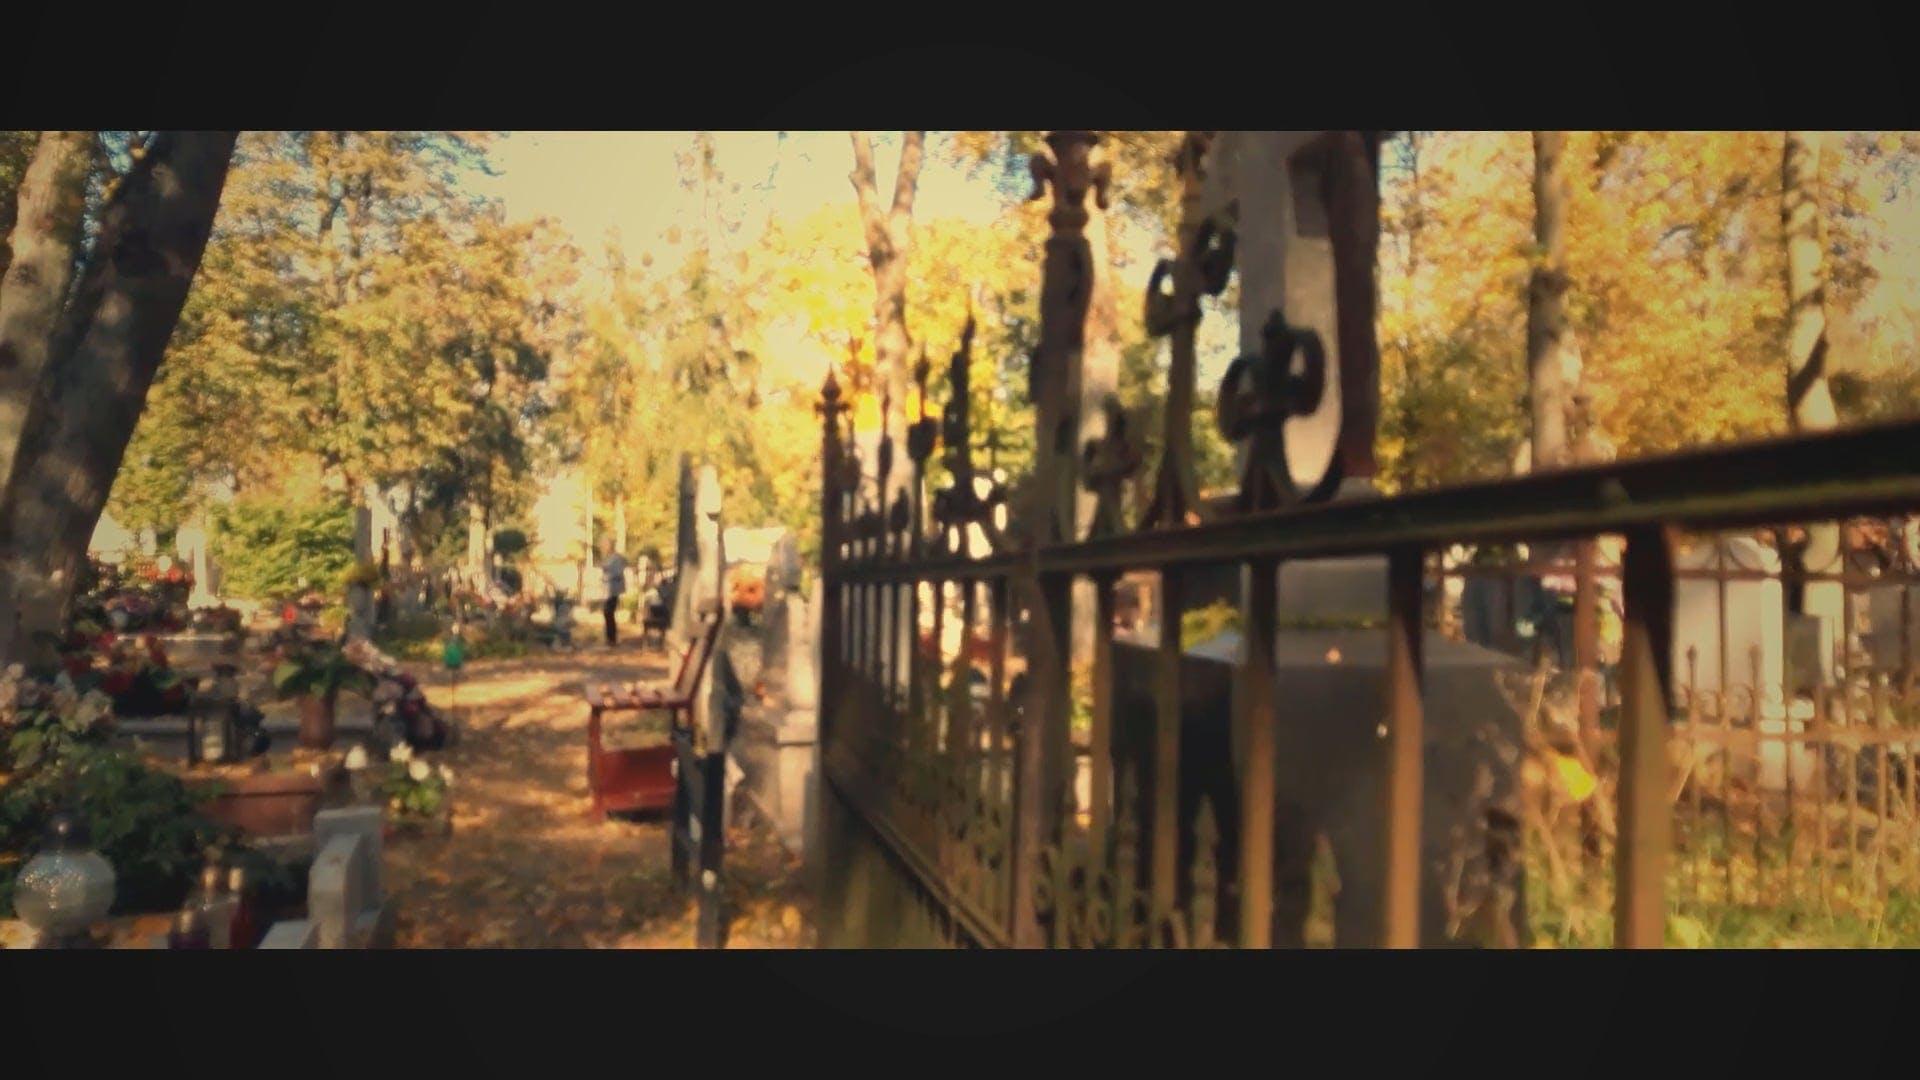 An Eerie Graveyard